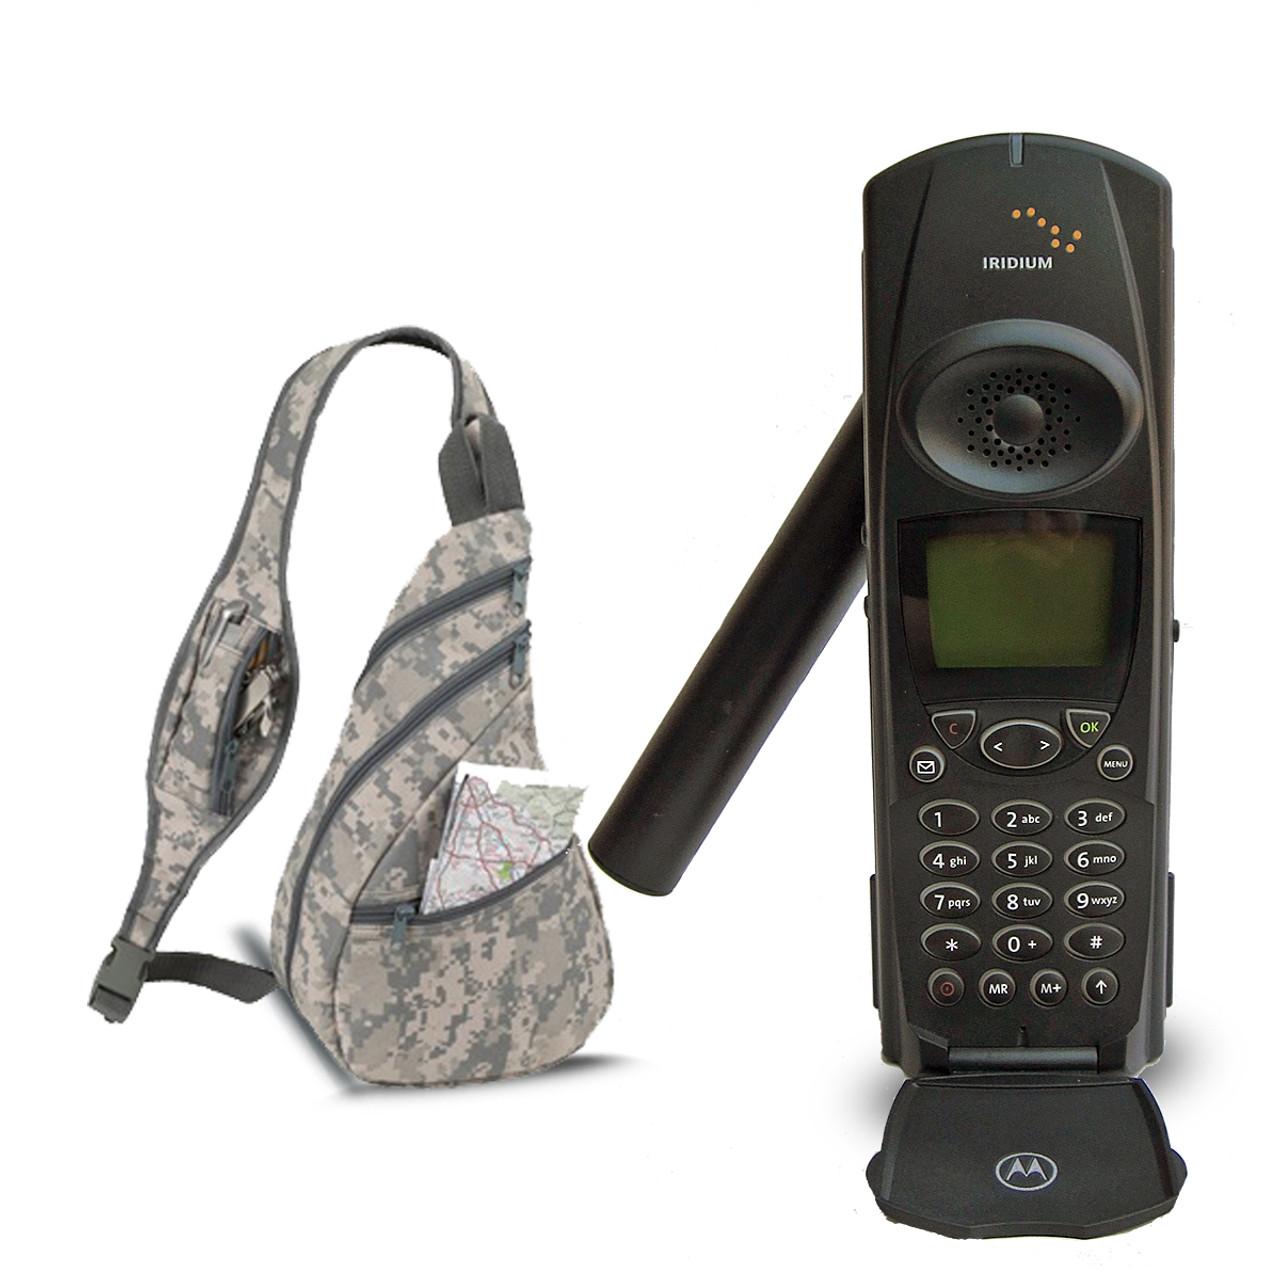 Iridium Motorola 9500 Satellite Phone w/Backpack-Used/Refurbished